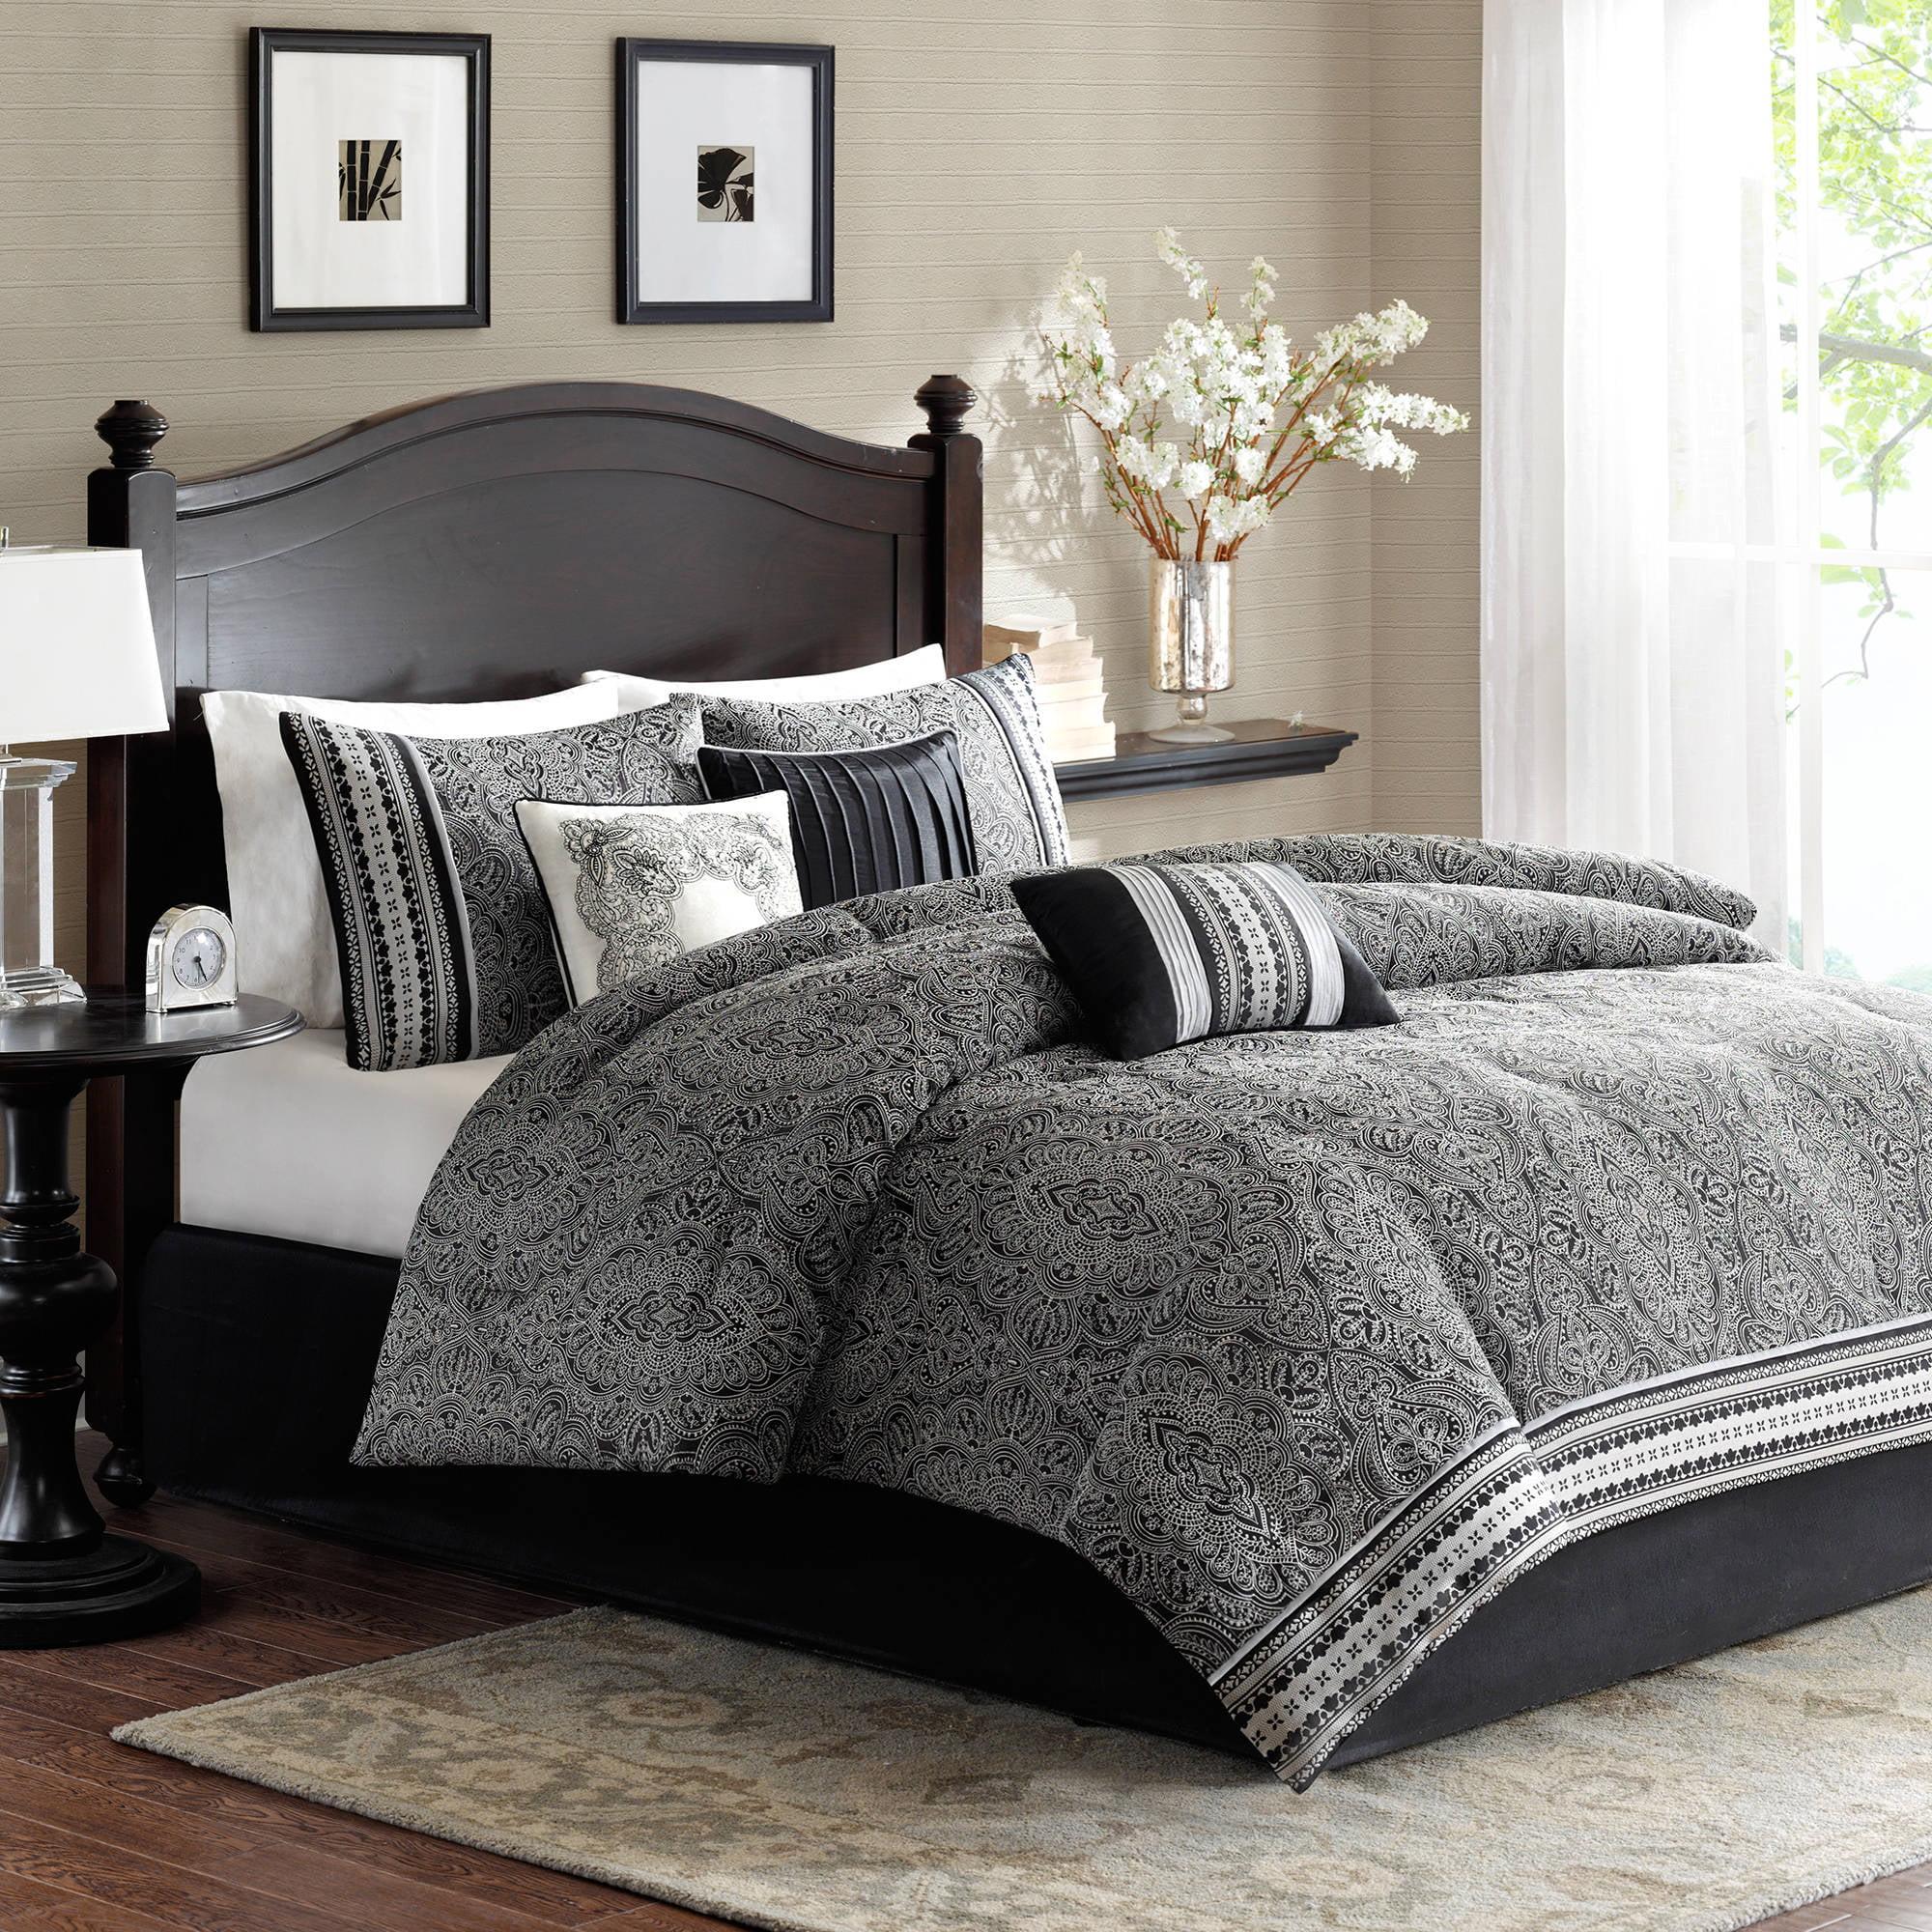 Home Essence Portola Bedding Comforter Set